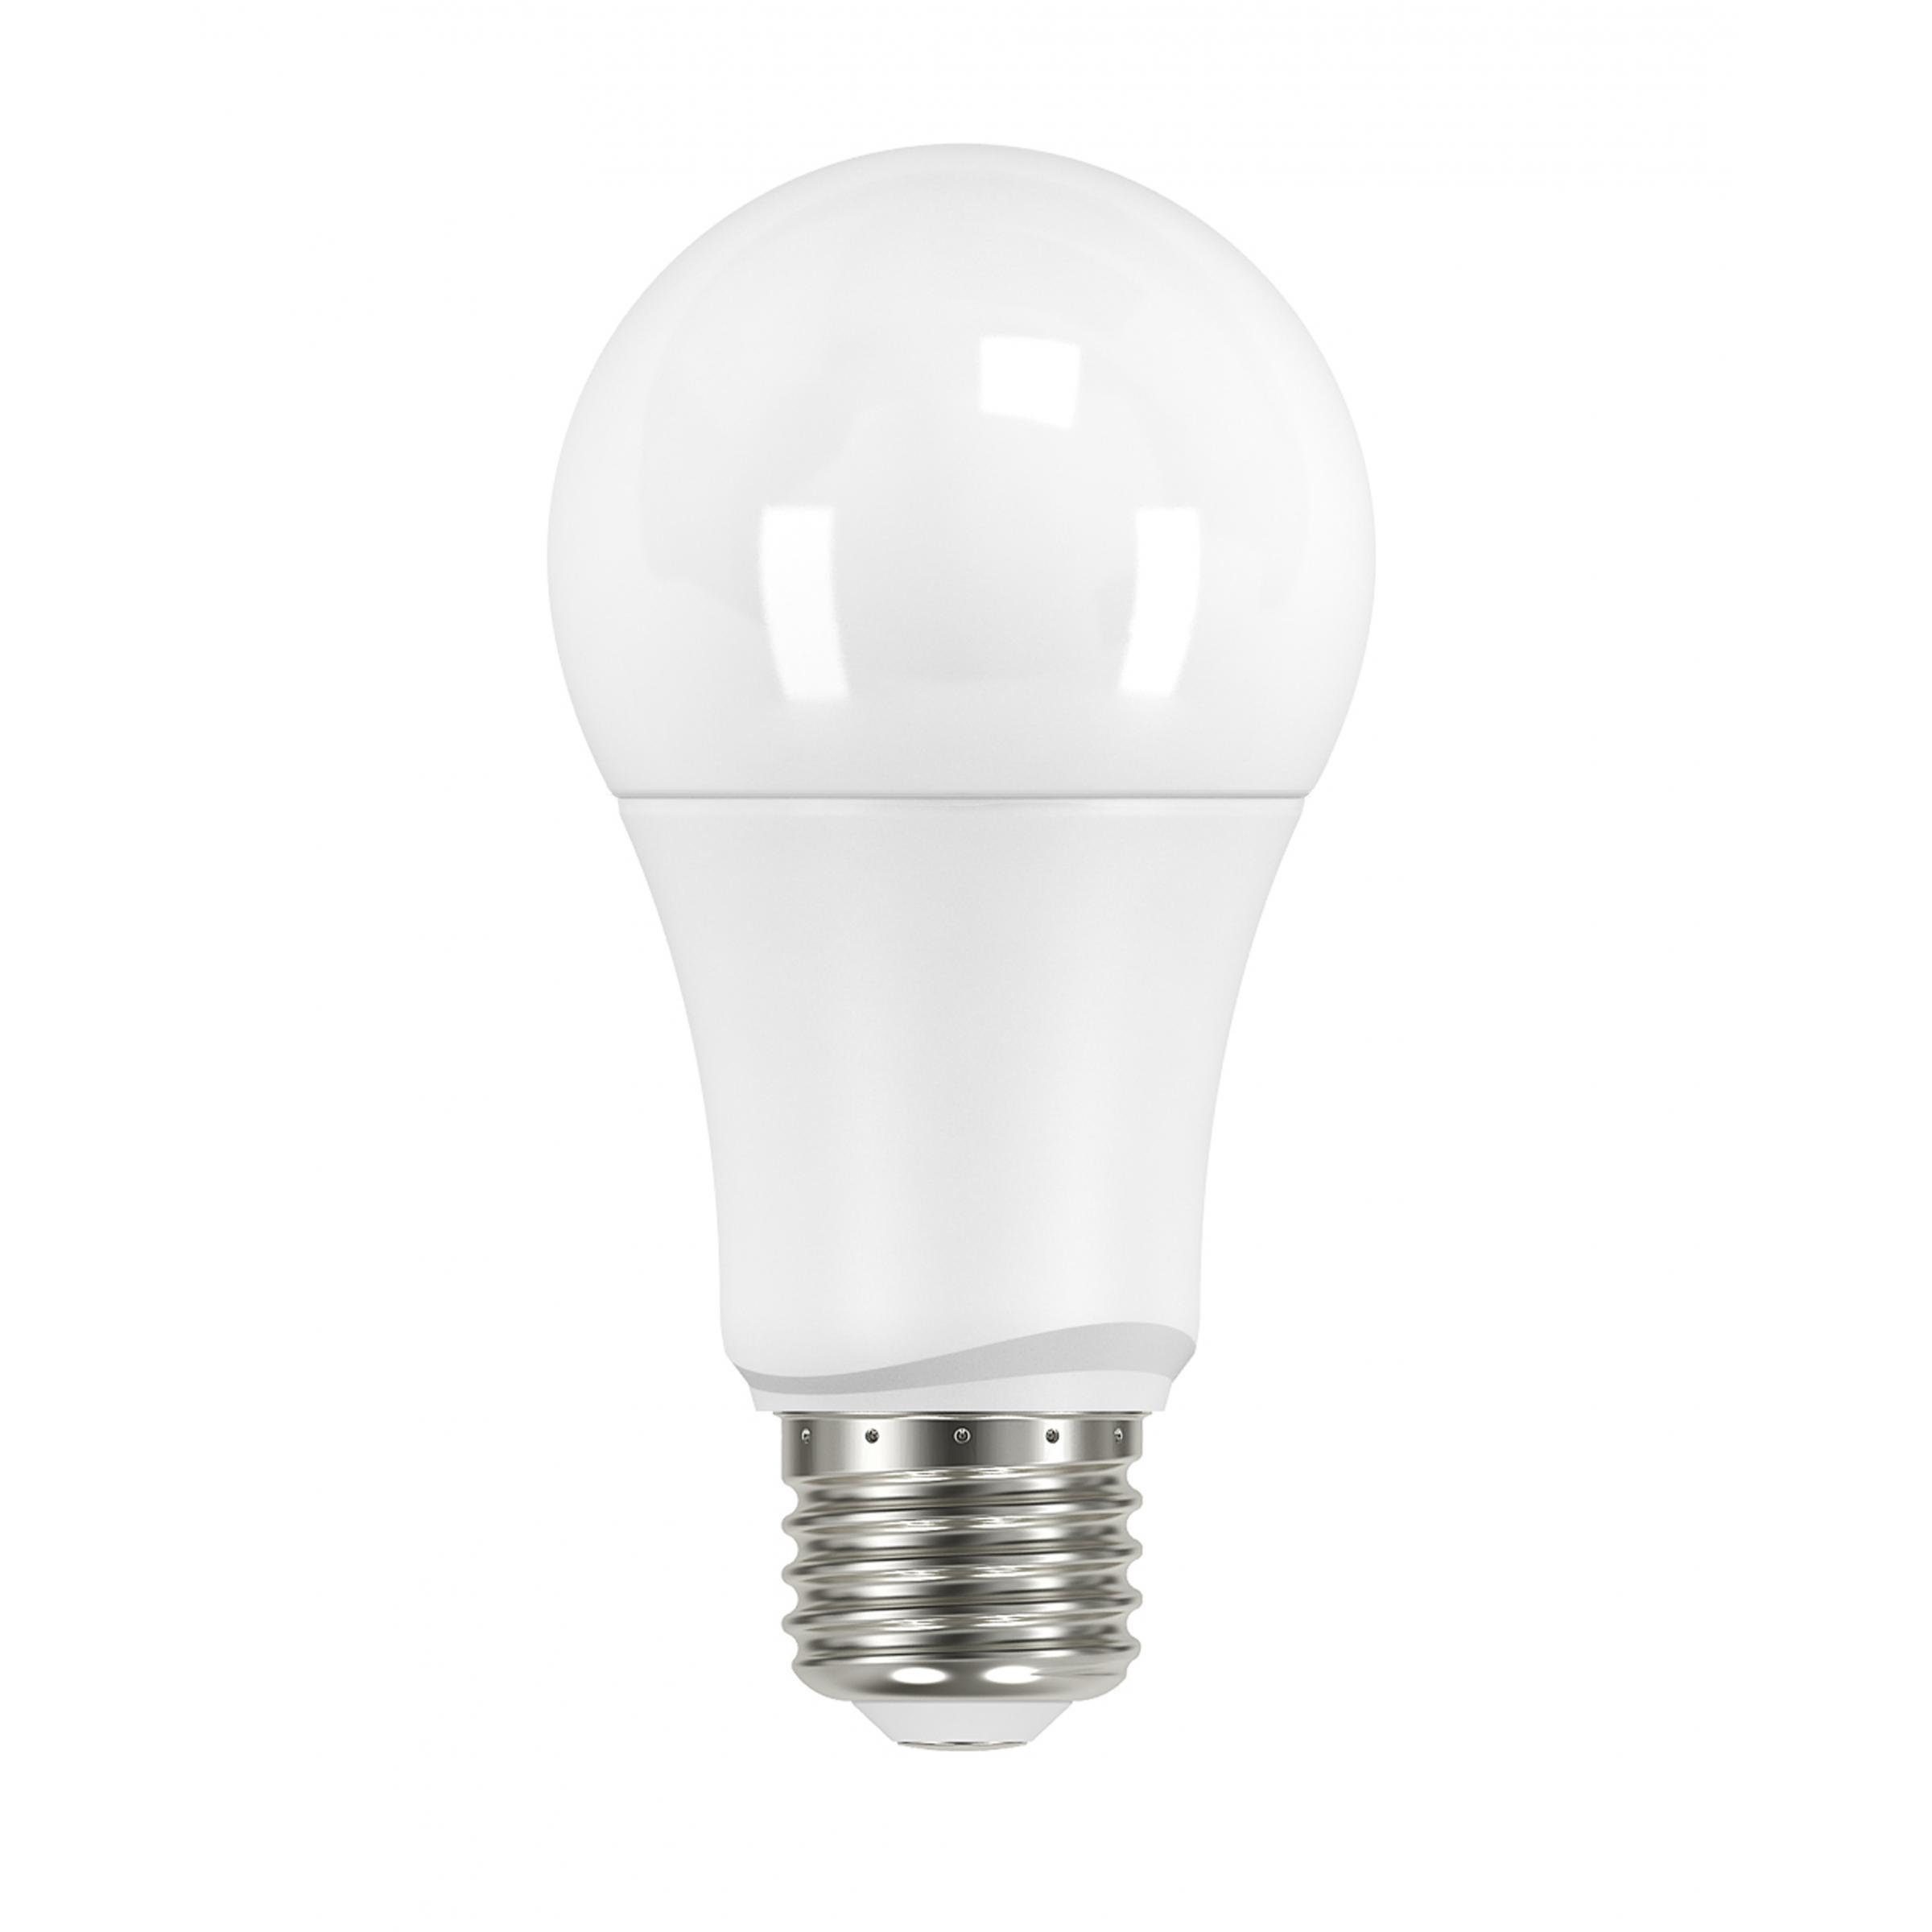 9.5W A19 LED Light Bulb - 60W Inc. Equal - 120V - E26 Medium Base - 800lm - 3000K